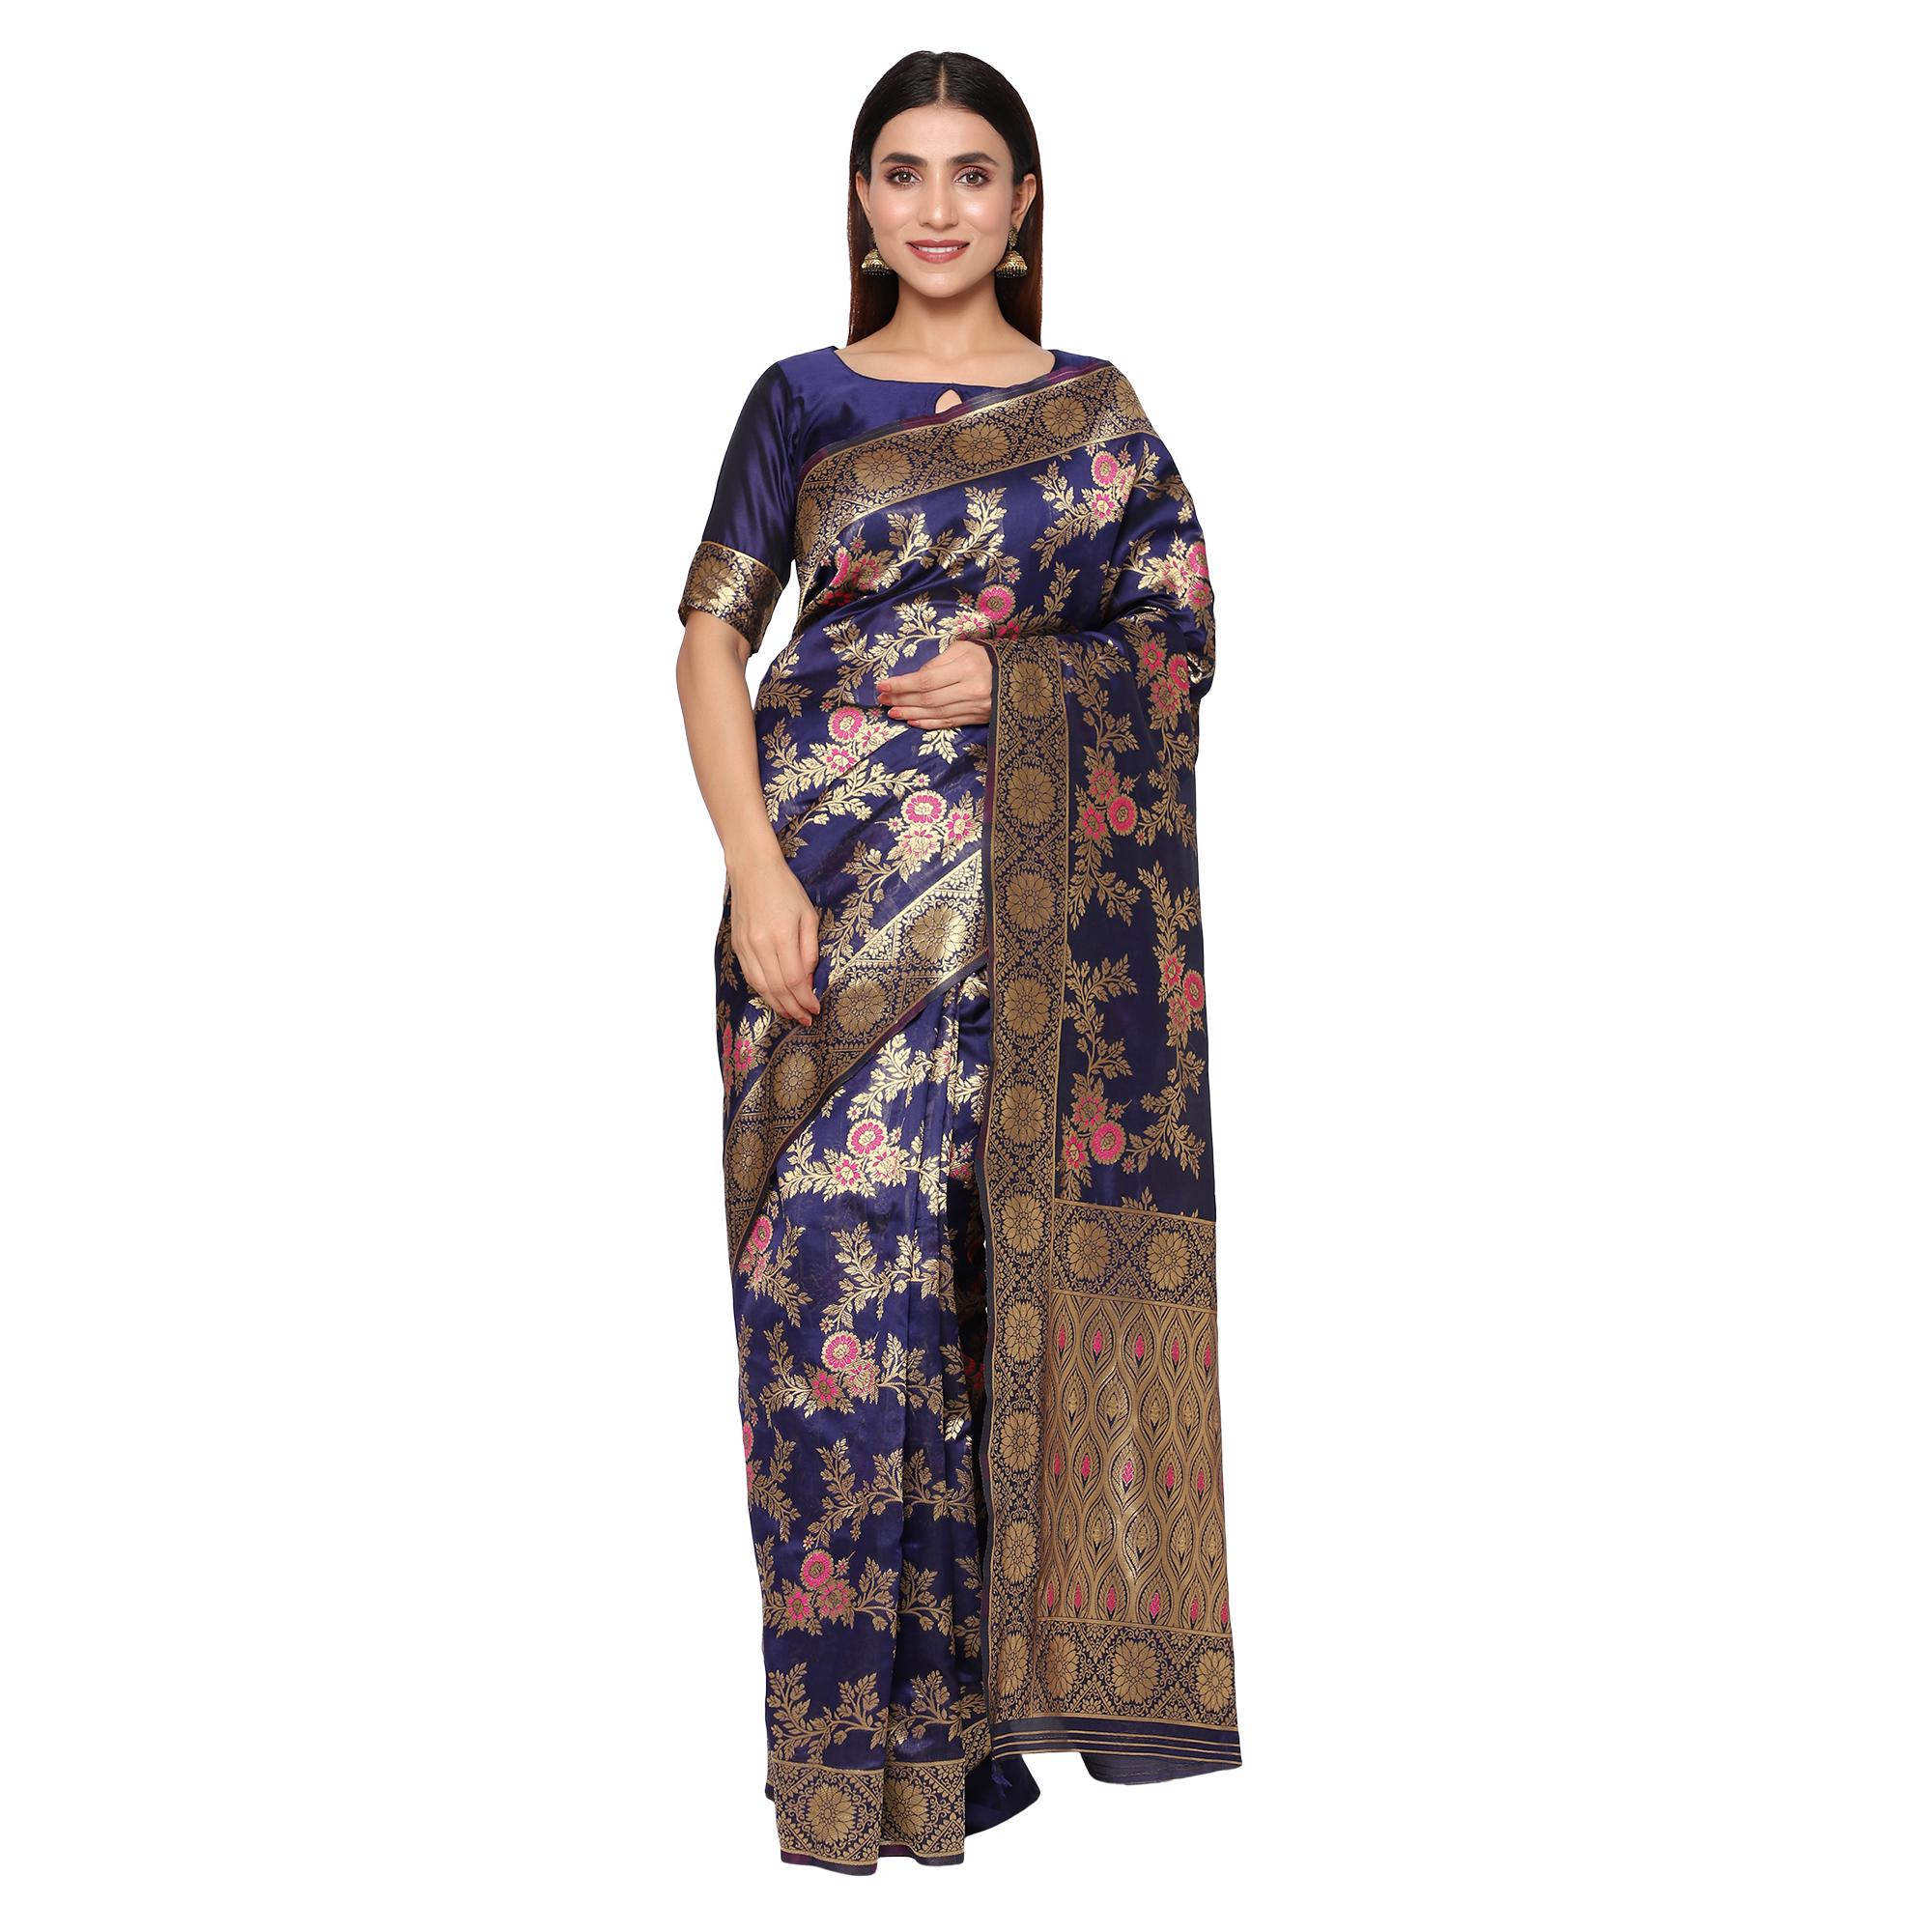 Glemora Nevy Blue Designer Ethnic Wear Silk Blend Banarasi Traditional Saree